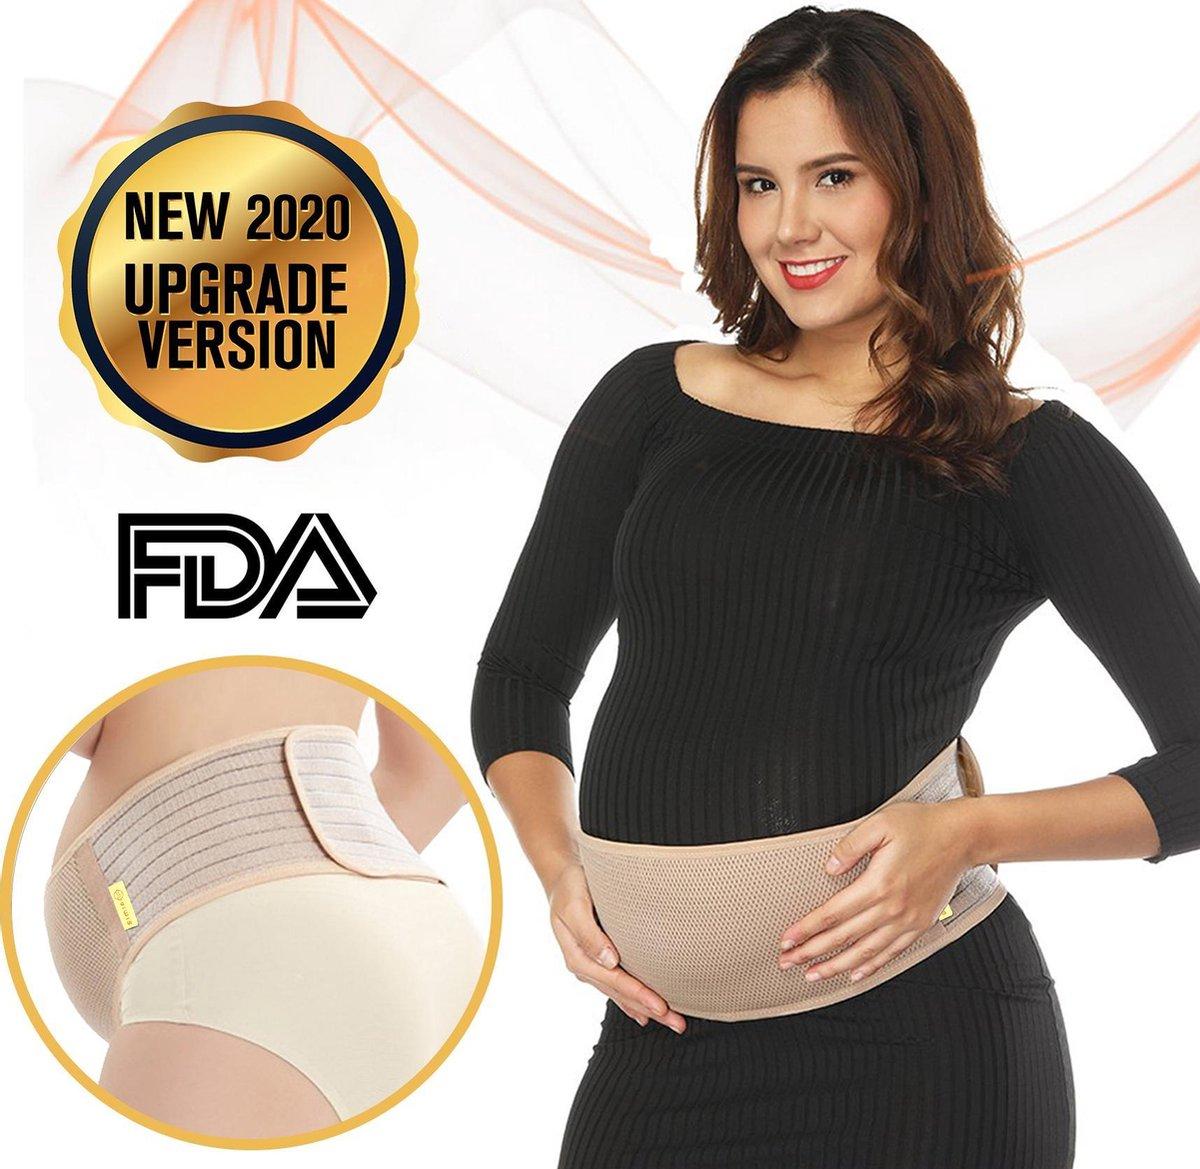 SIMIA™ Premium Zwangerschapsband - Verstelbaar buikband - Bekkenband - Ondersteuning - Tegen rugklac